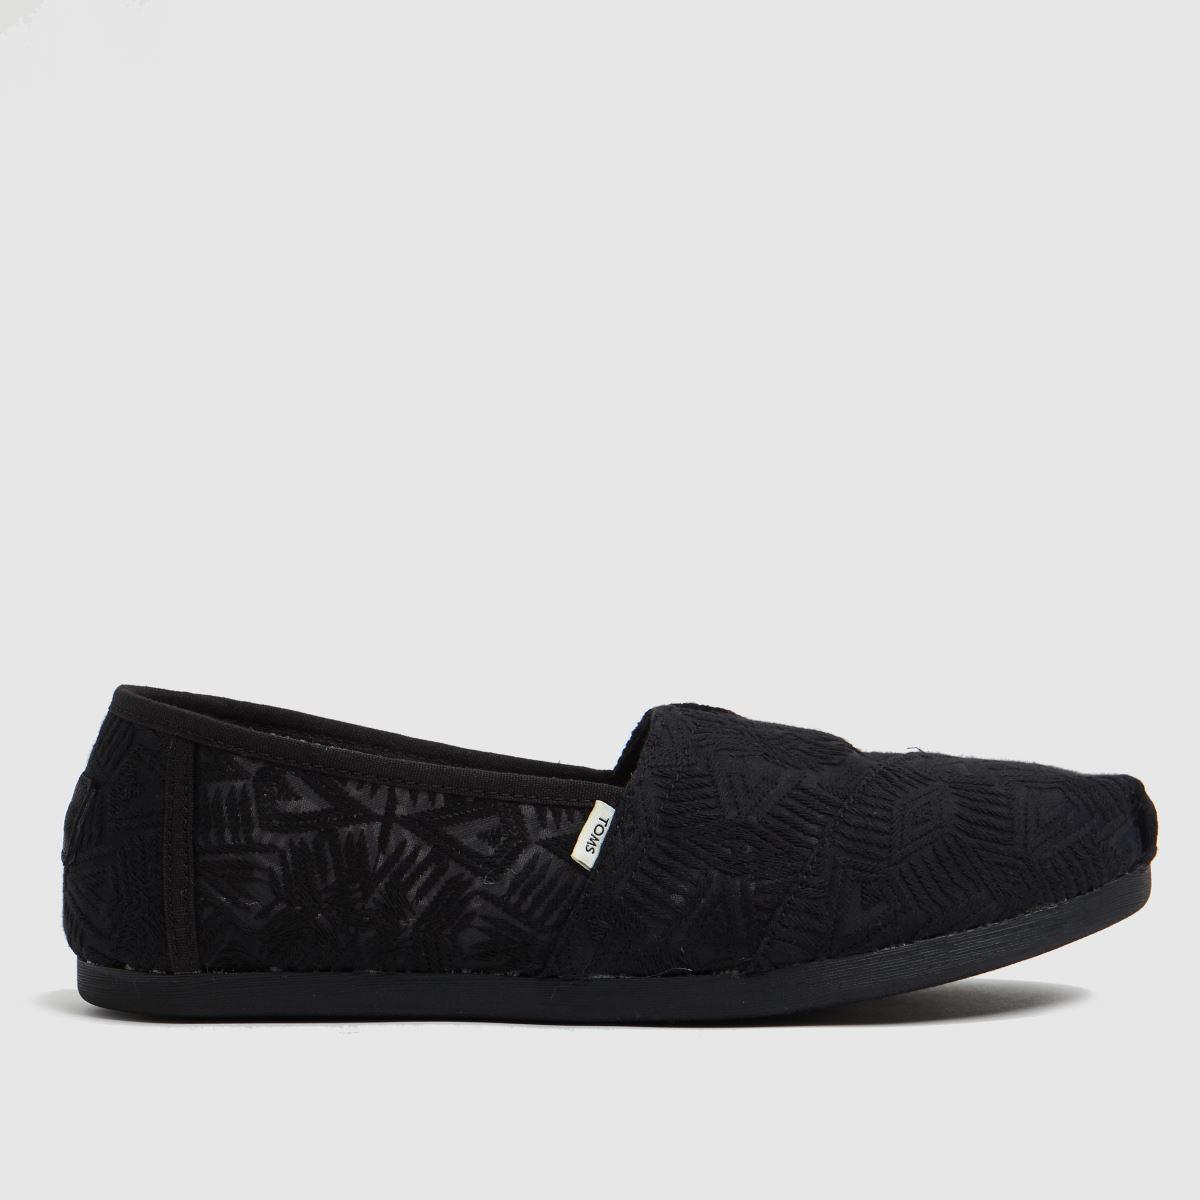 TOMS Black Alpargata 3.0 Vegan Flat Shoes